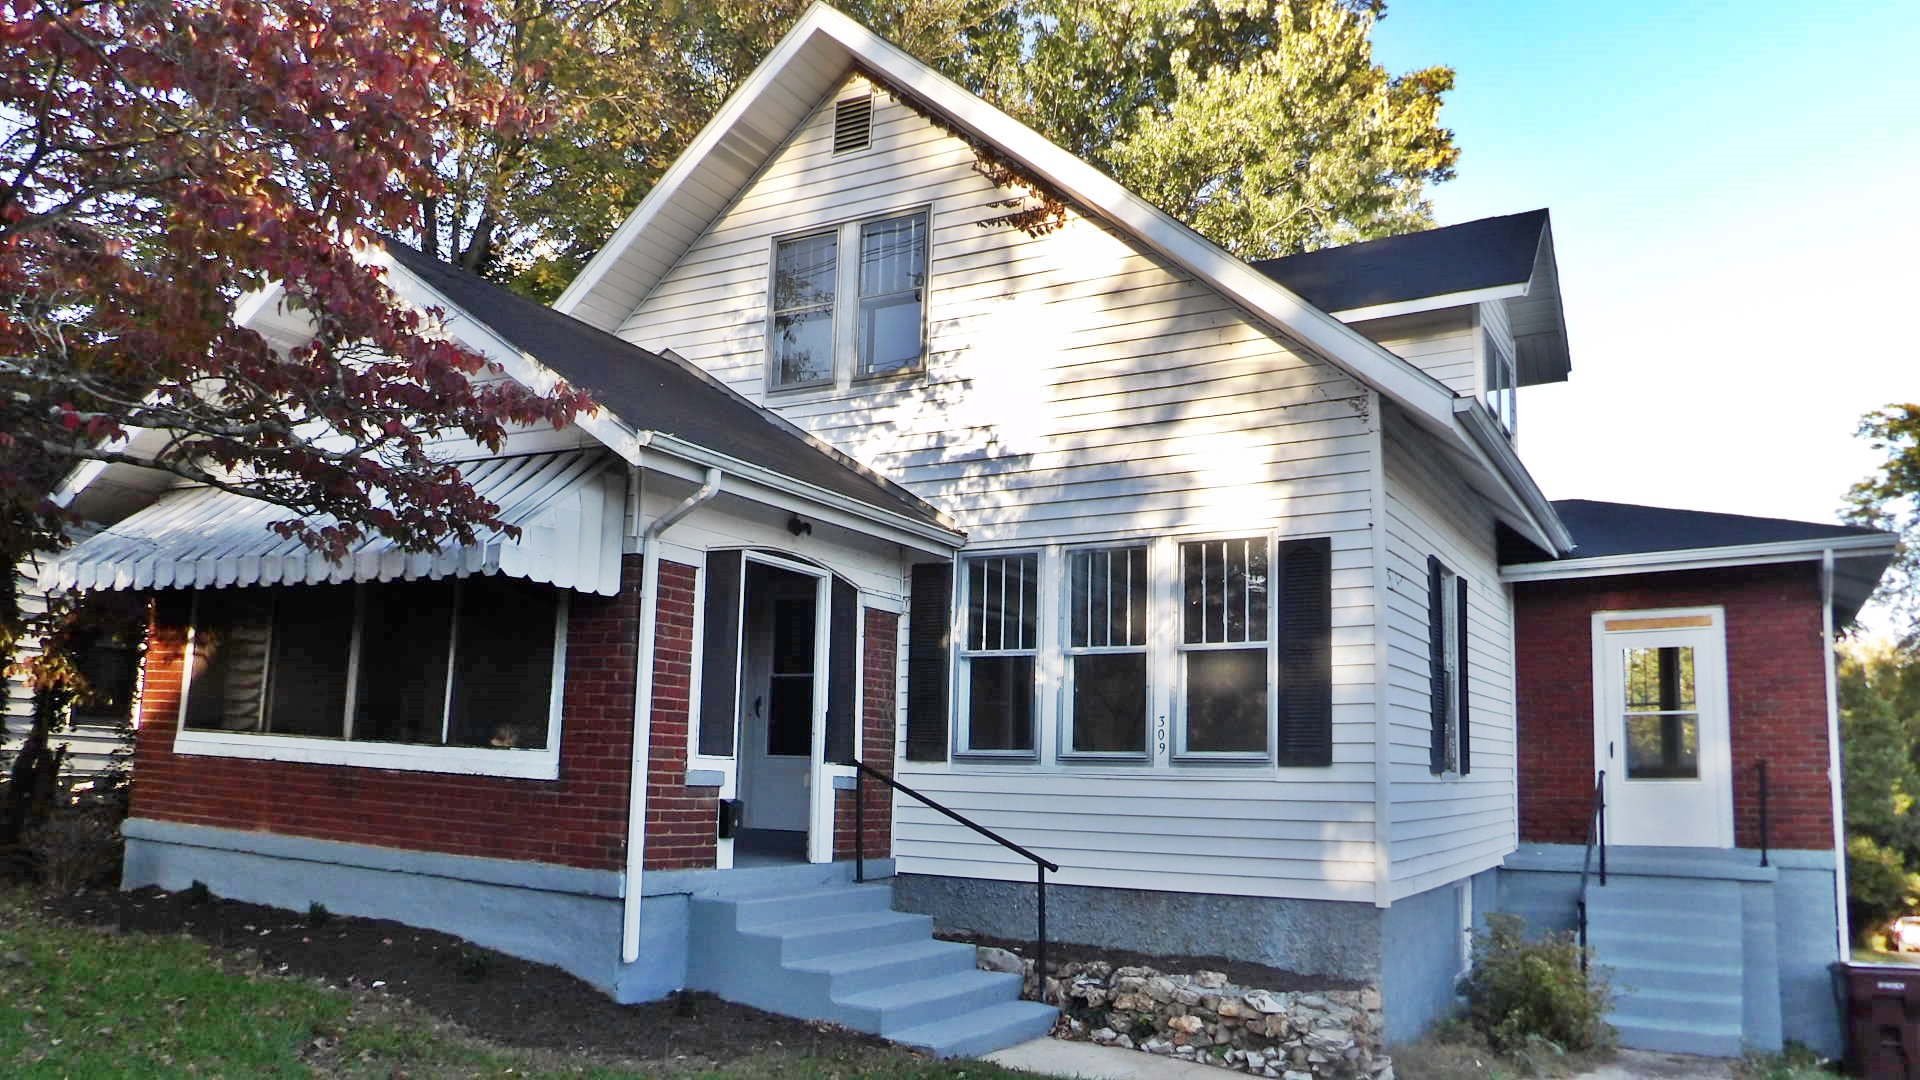 309 N Maple St, Somerset, Kentucky 42501